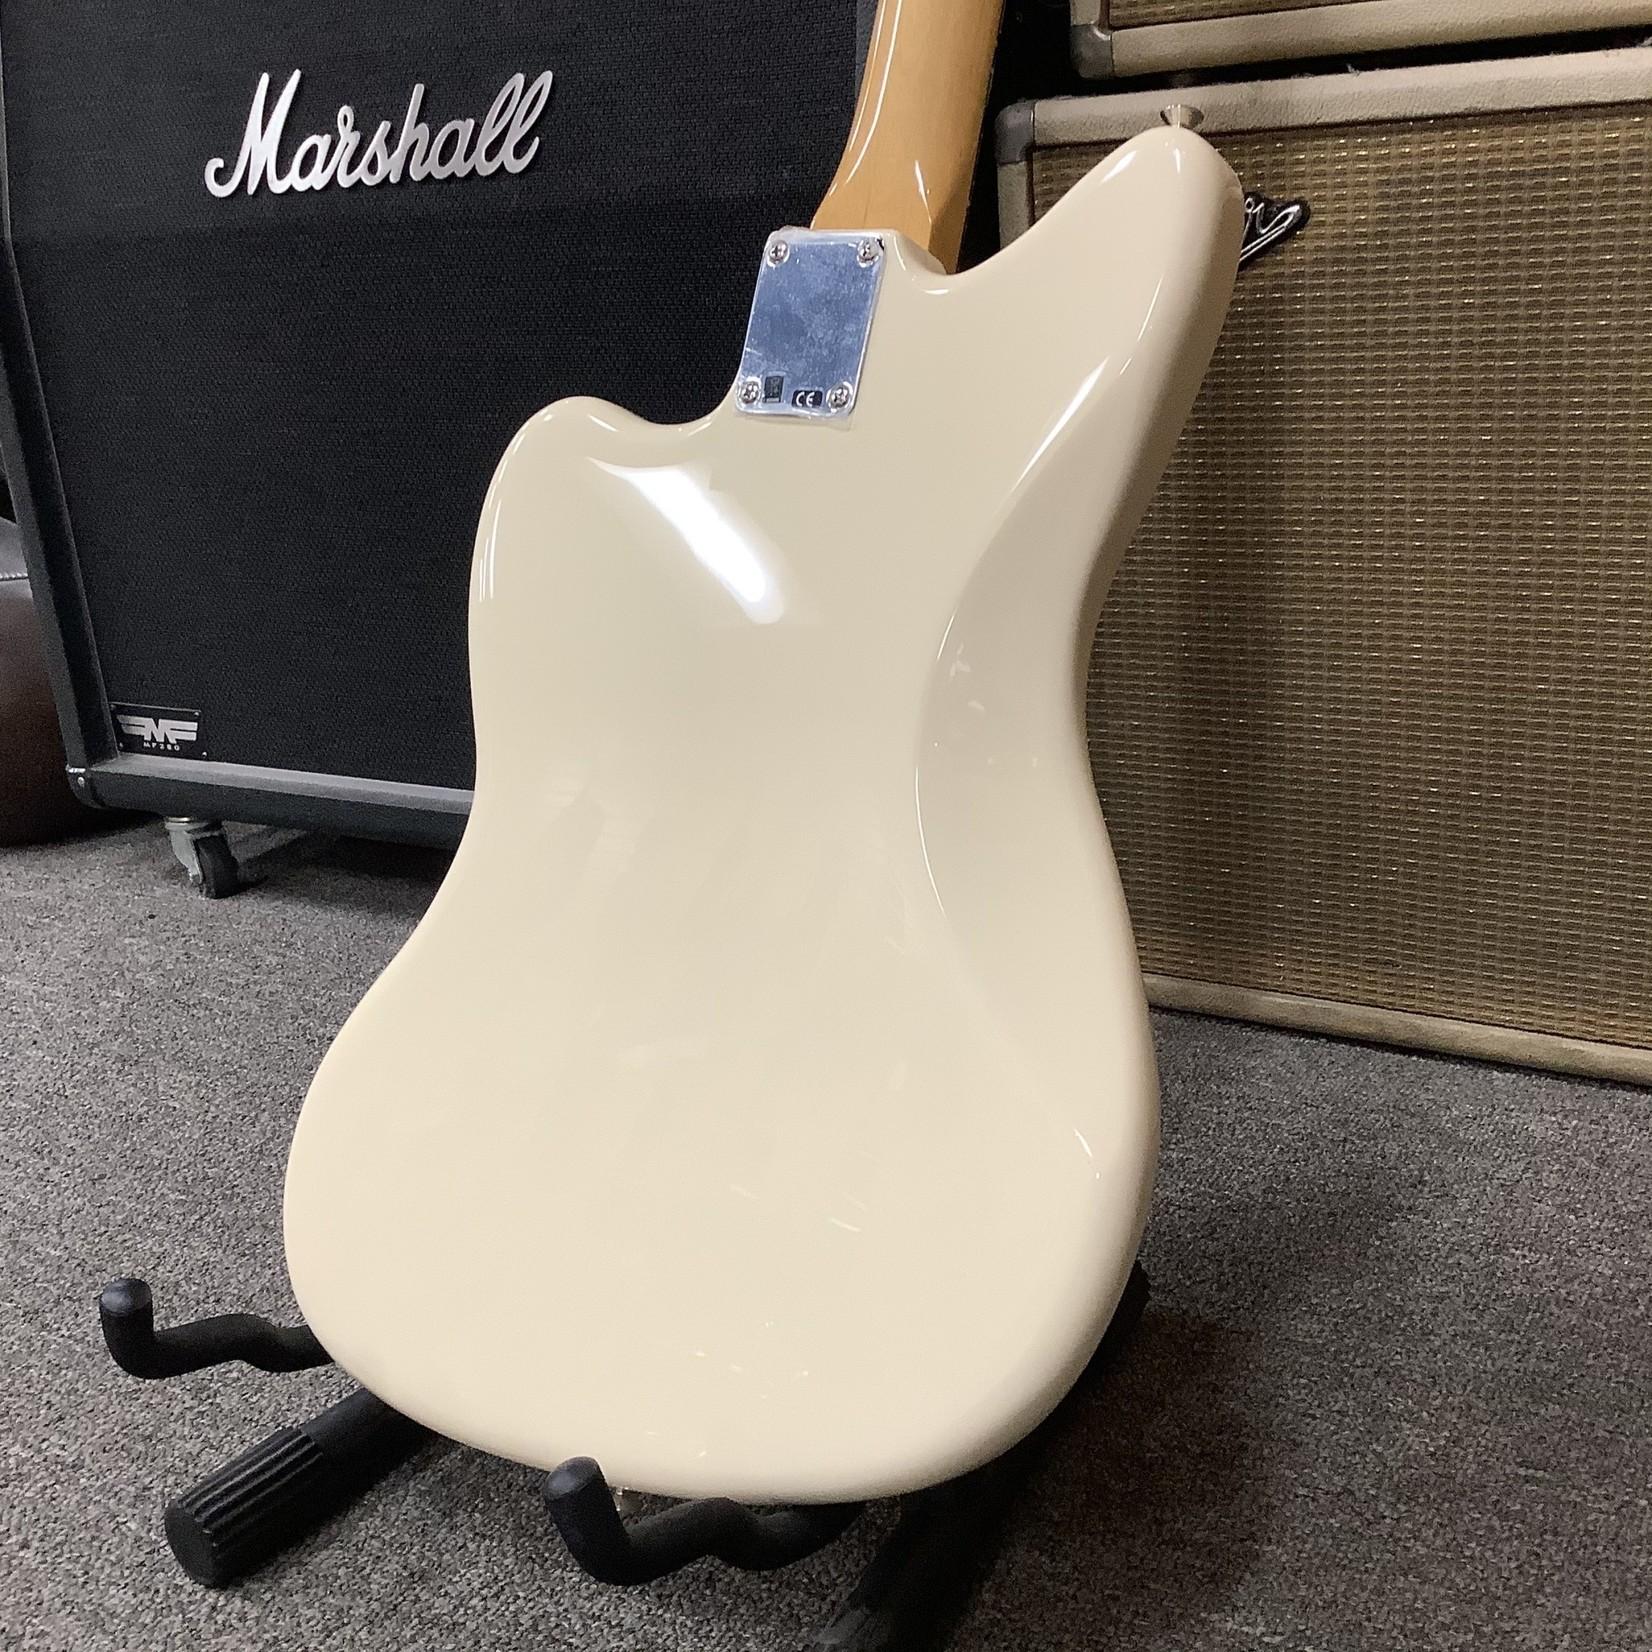 Fender Brand New Fender Vintera 60's Pau Ferro Jazzmaster in Olympic White